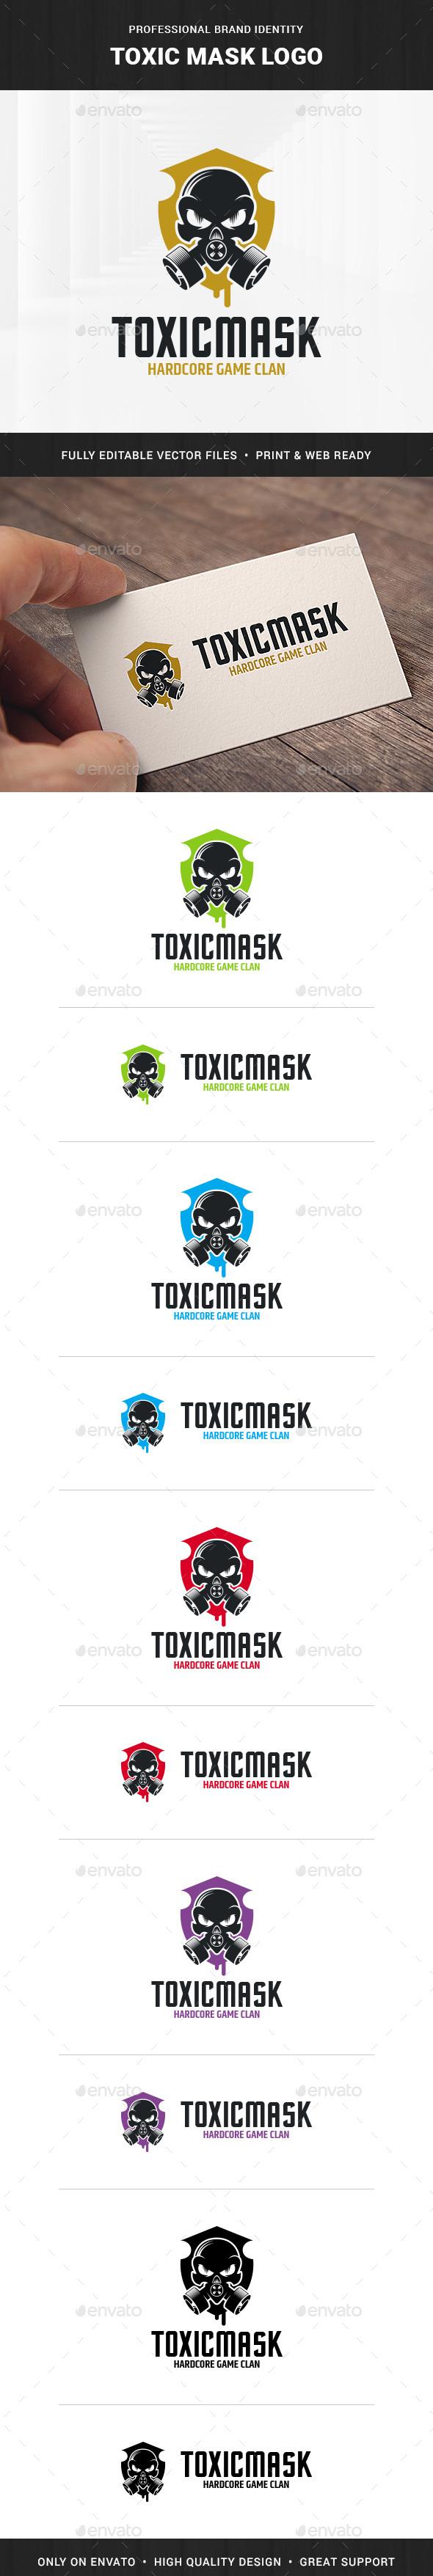 Toxic Mask Logo Template